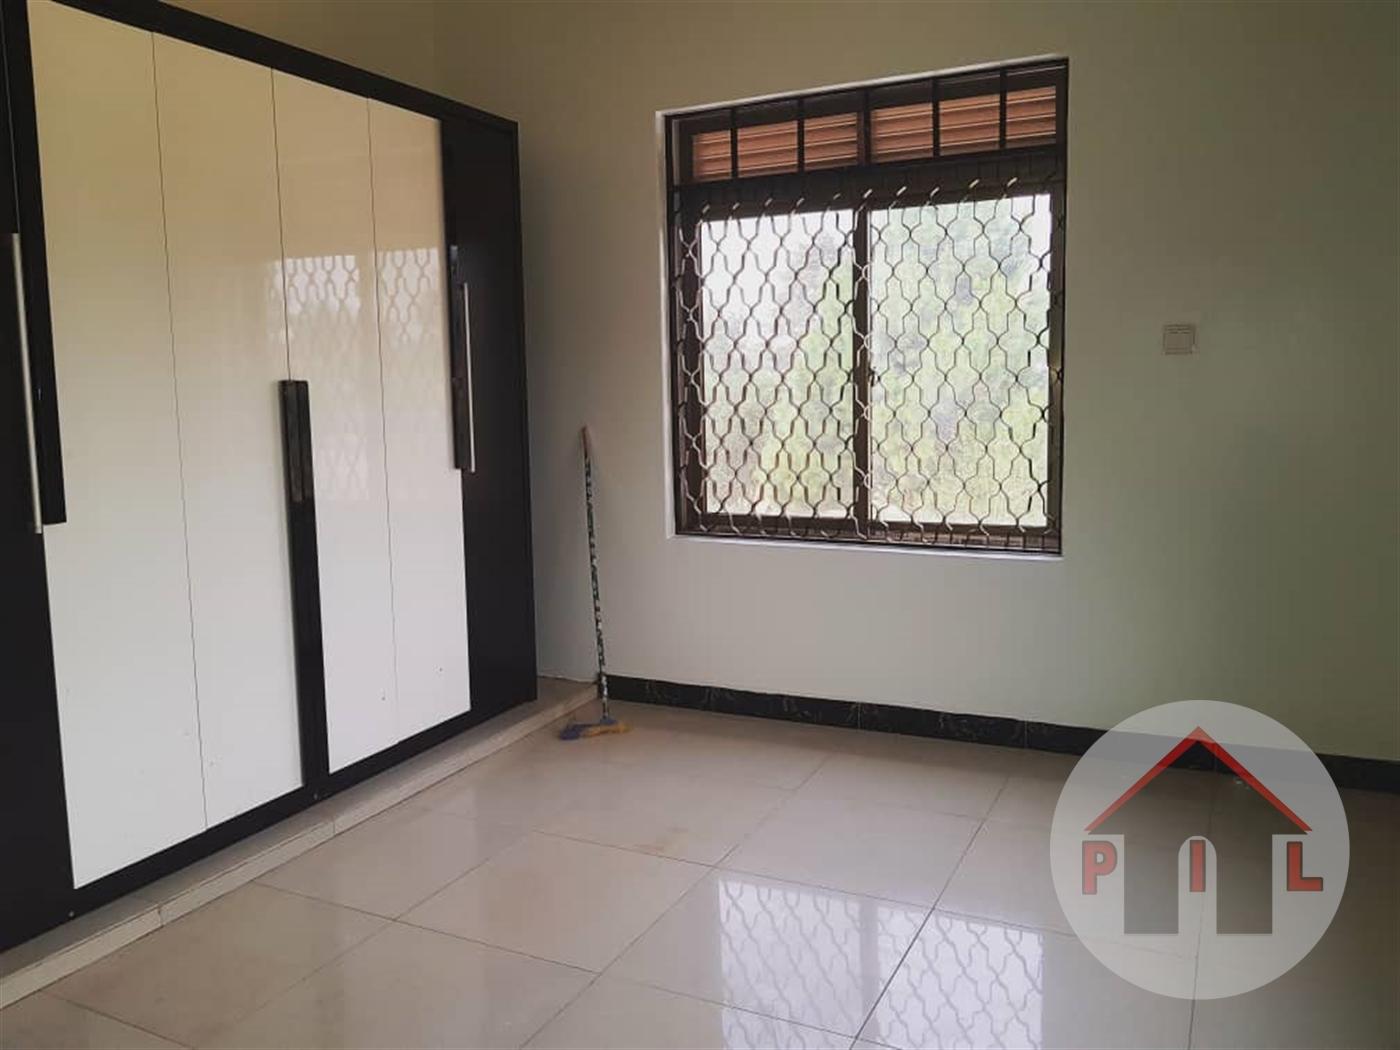 Mansion for sale in Nakwero Wakiso